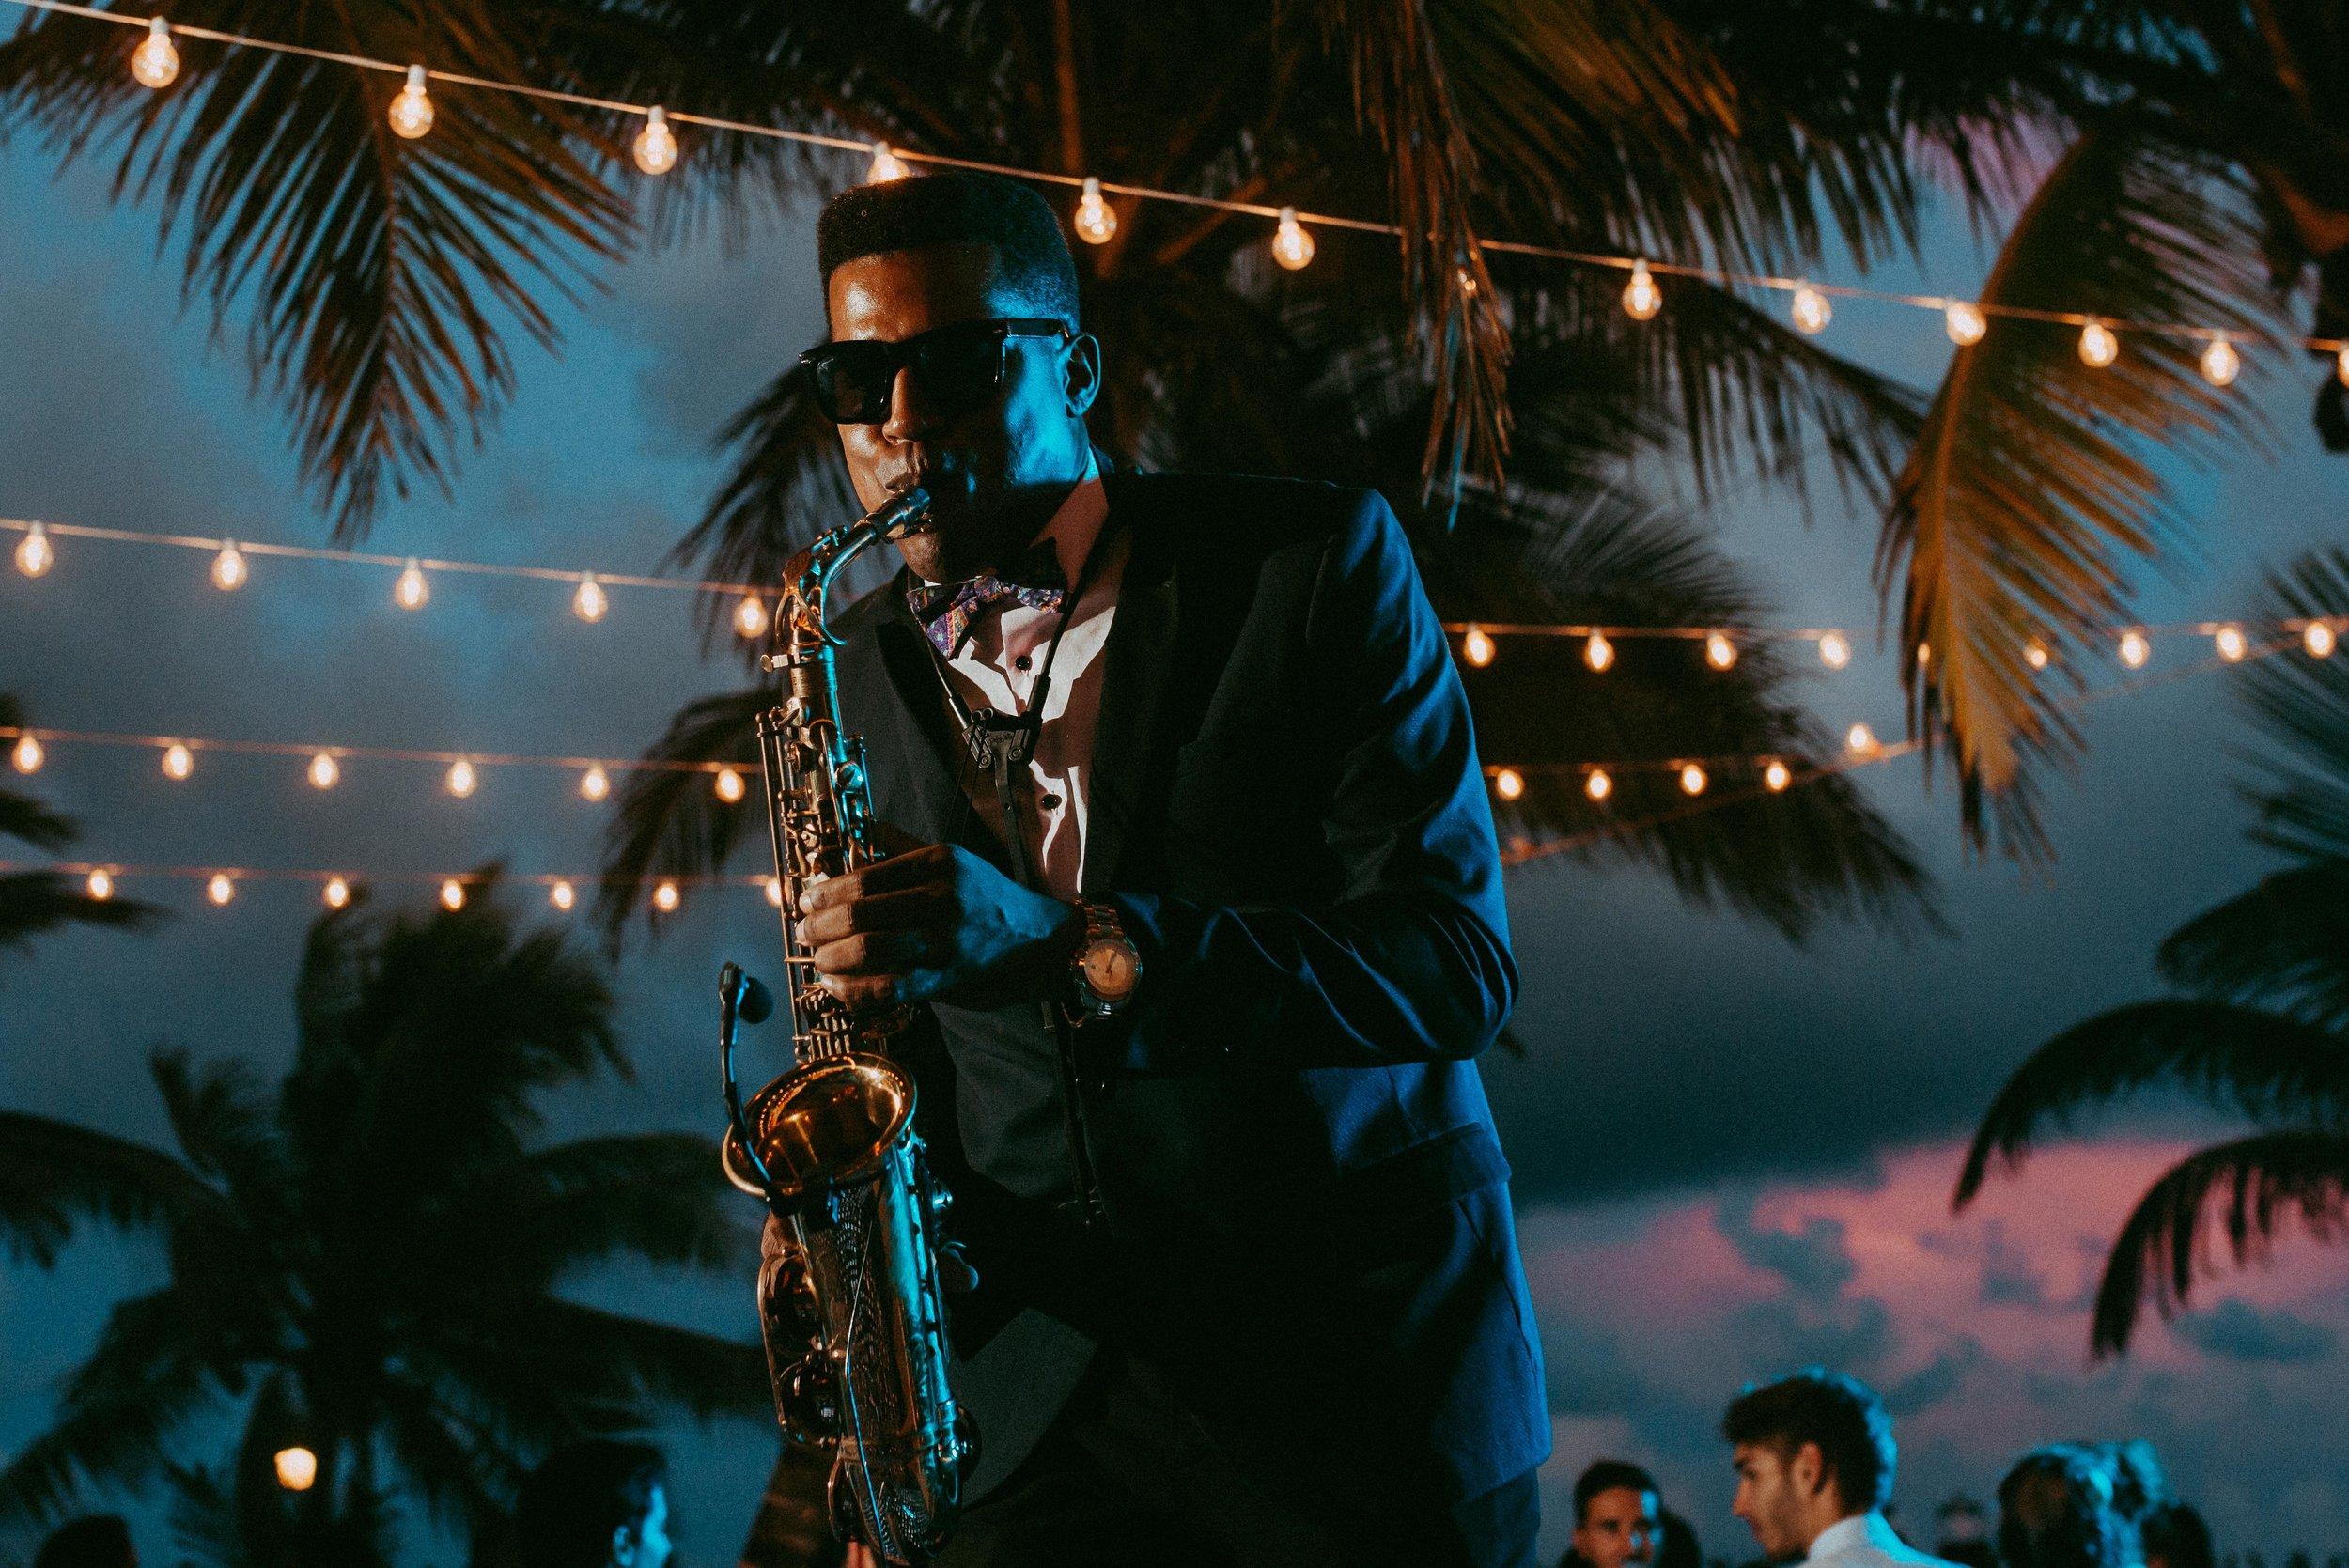 wedding playa del carmen mexico2-15.jpg